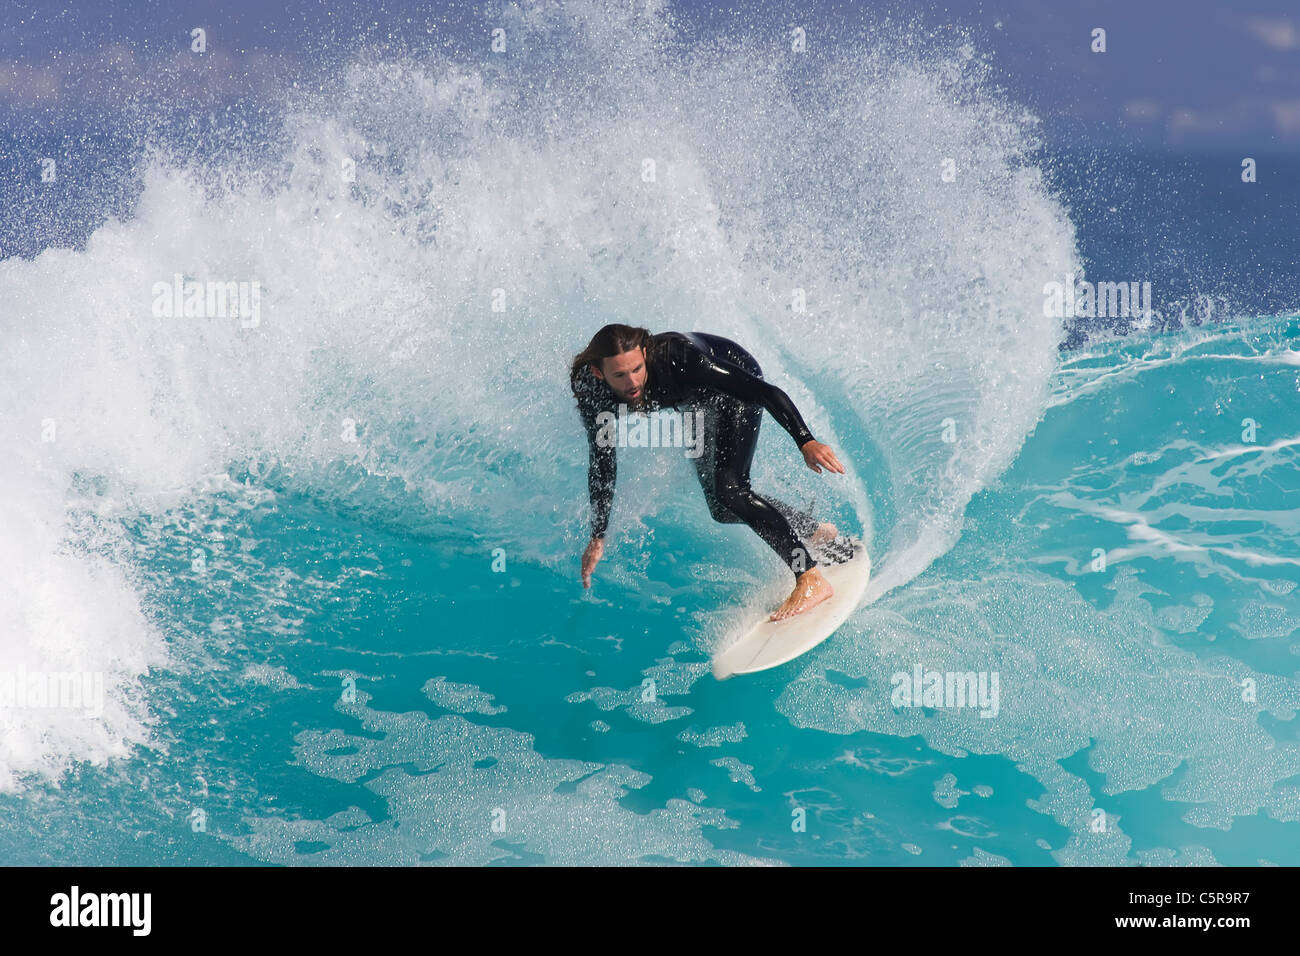 Surfer fährt mit Azure blaue Welle. Stockbild